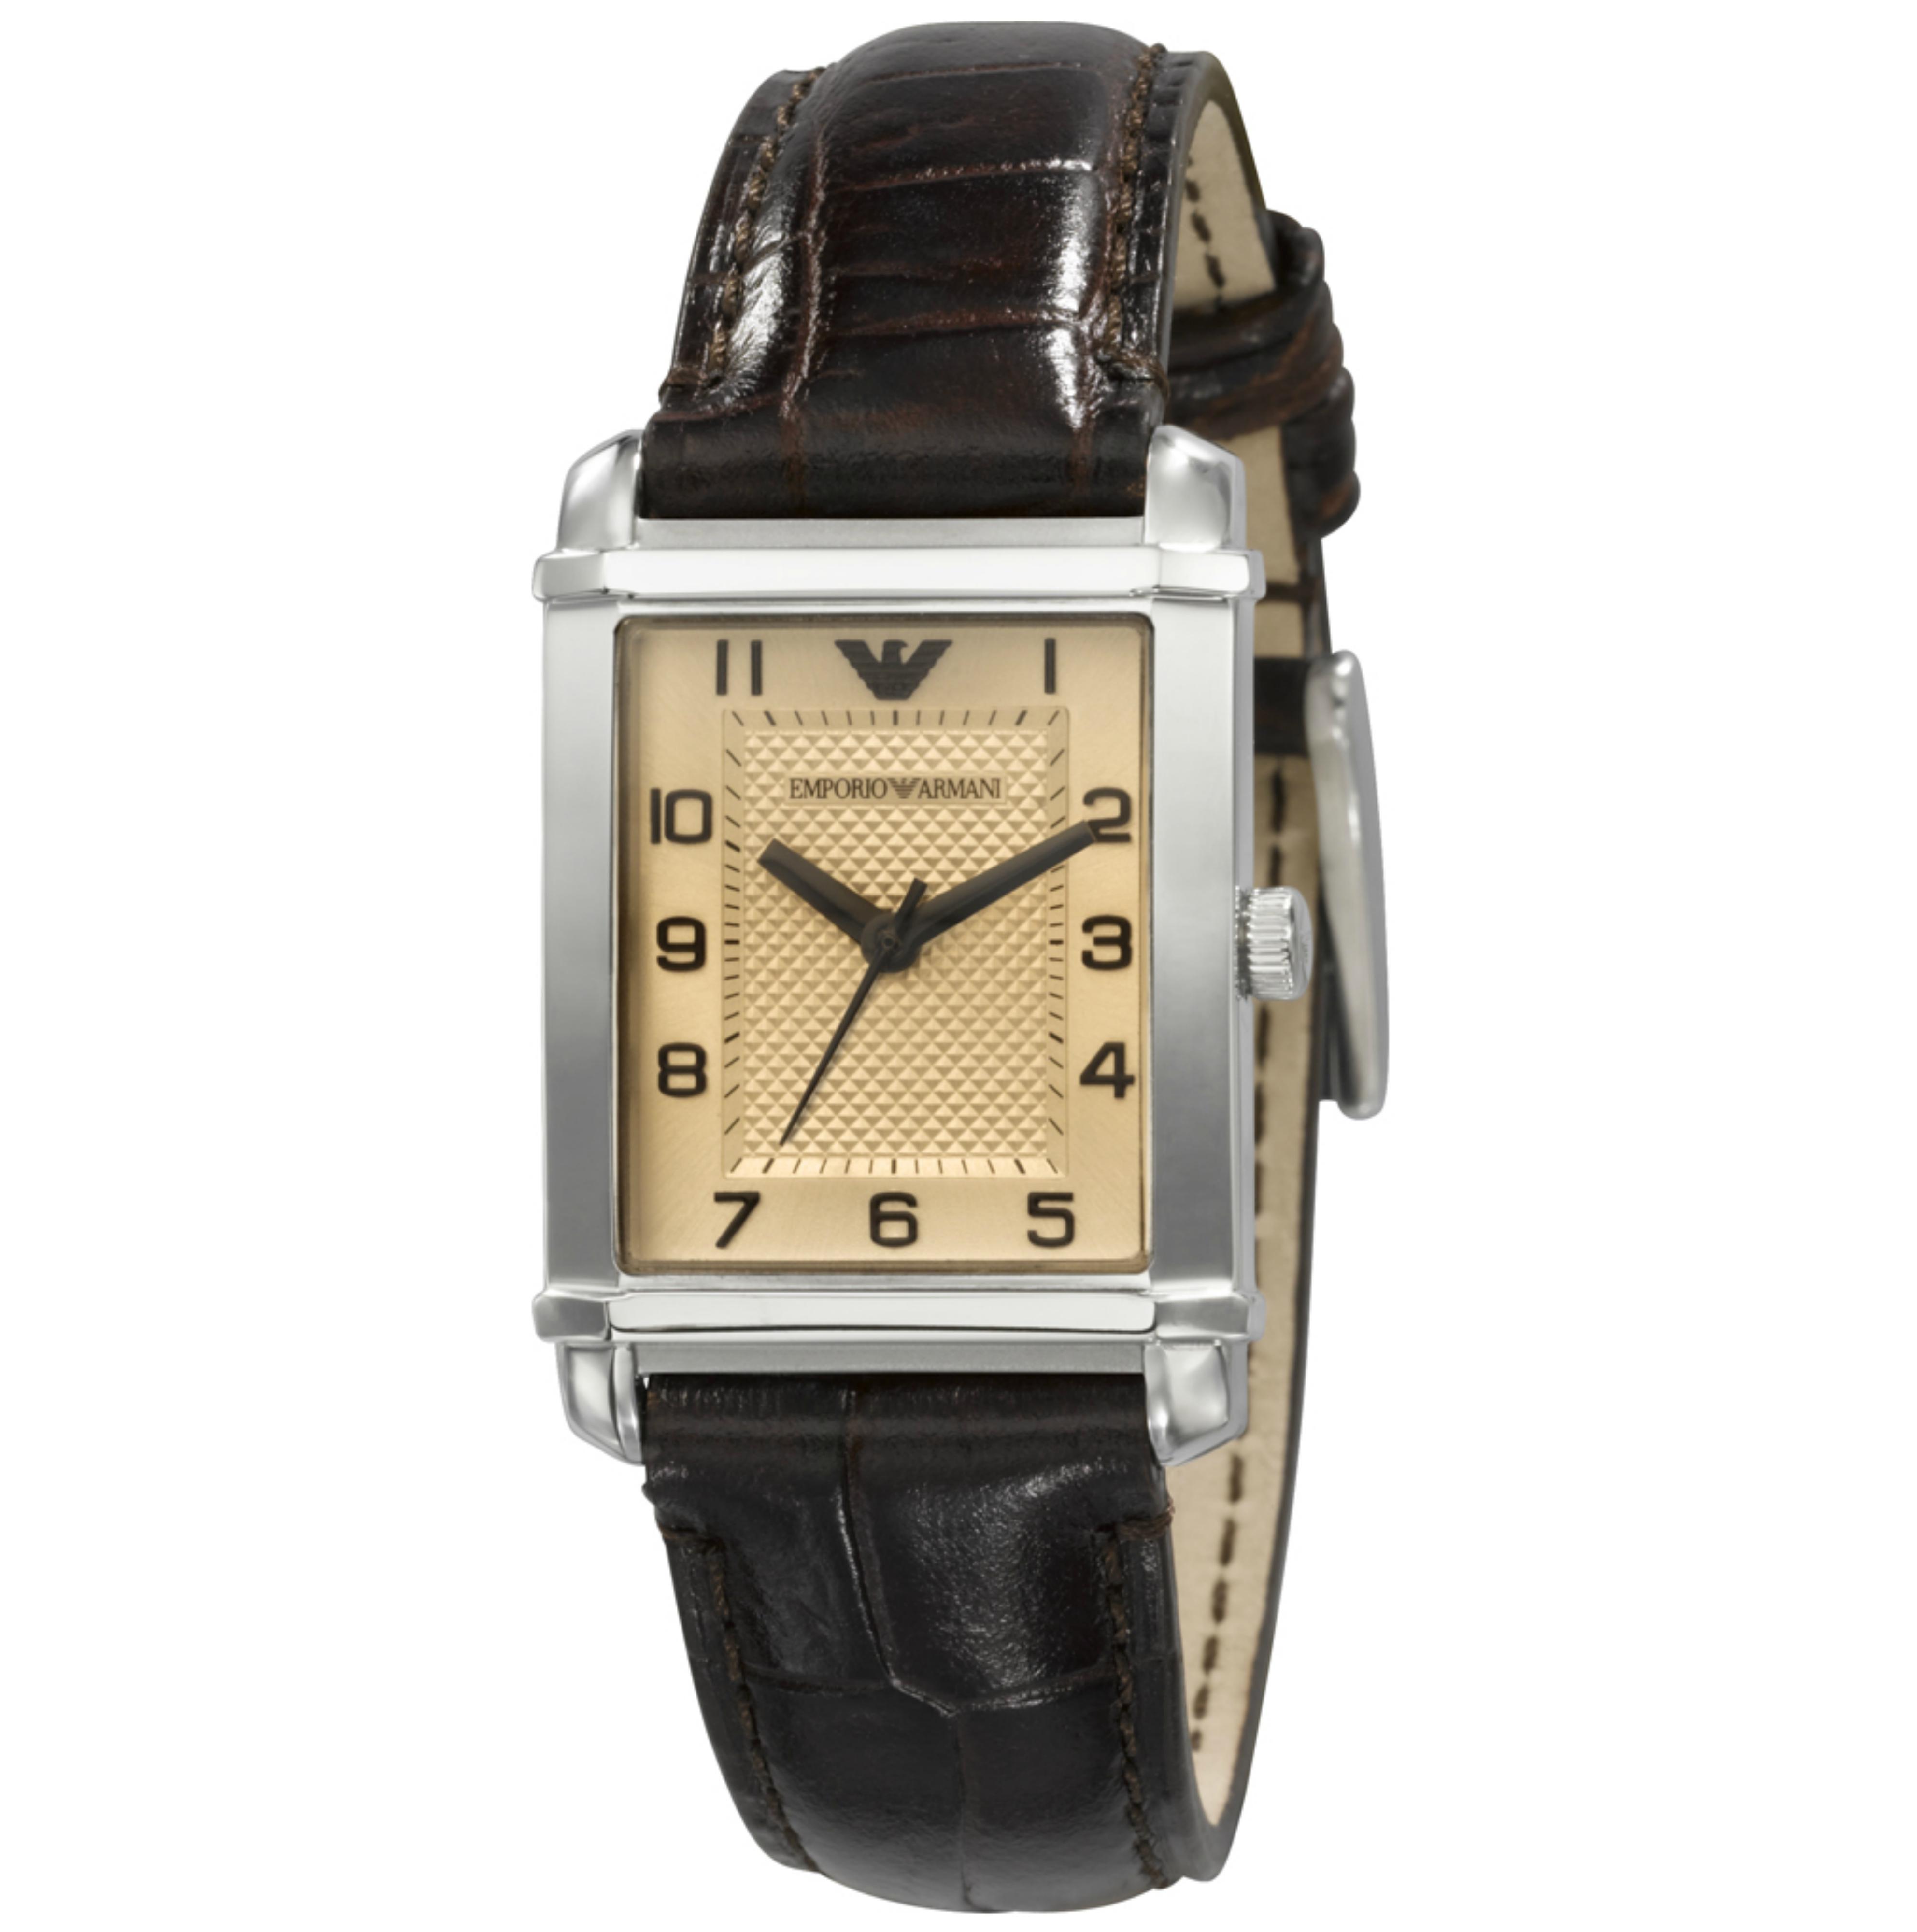 Emporio Armani Women's|Marco Small|Brown Leather Strap|Analog Wrist Watch|AR049|